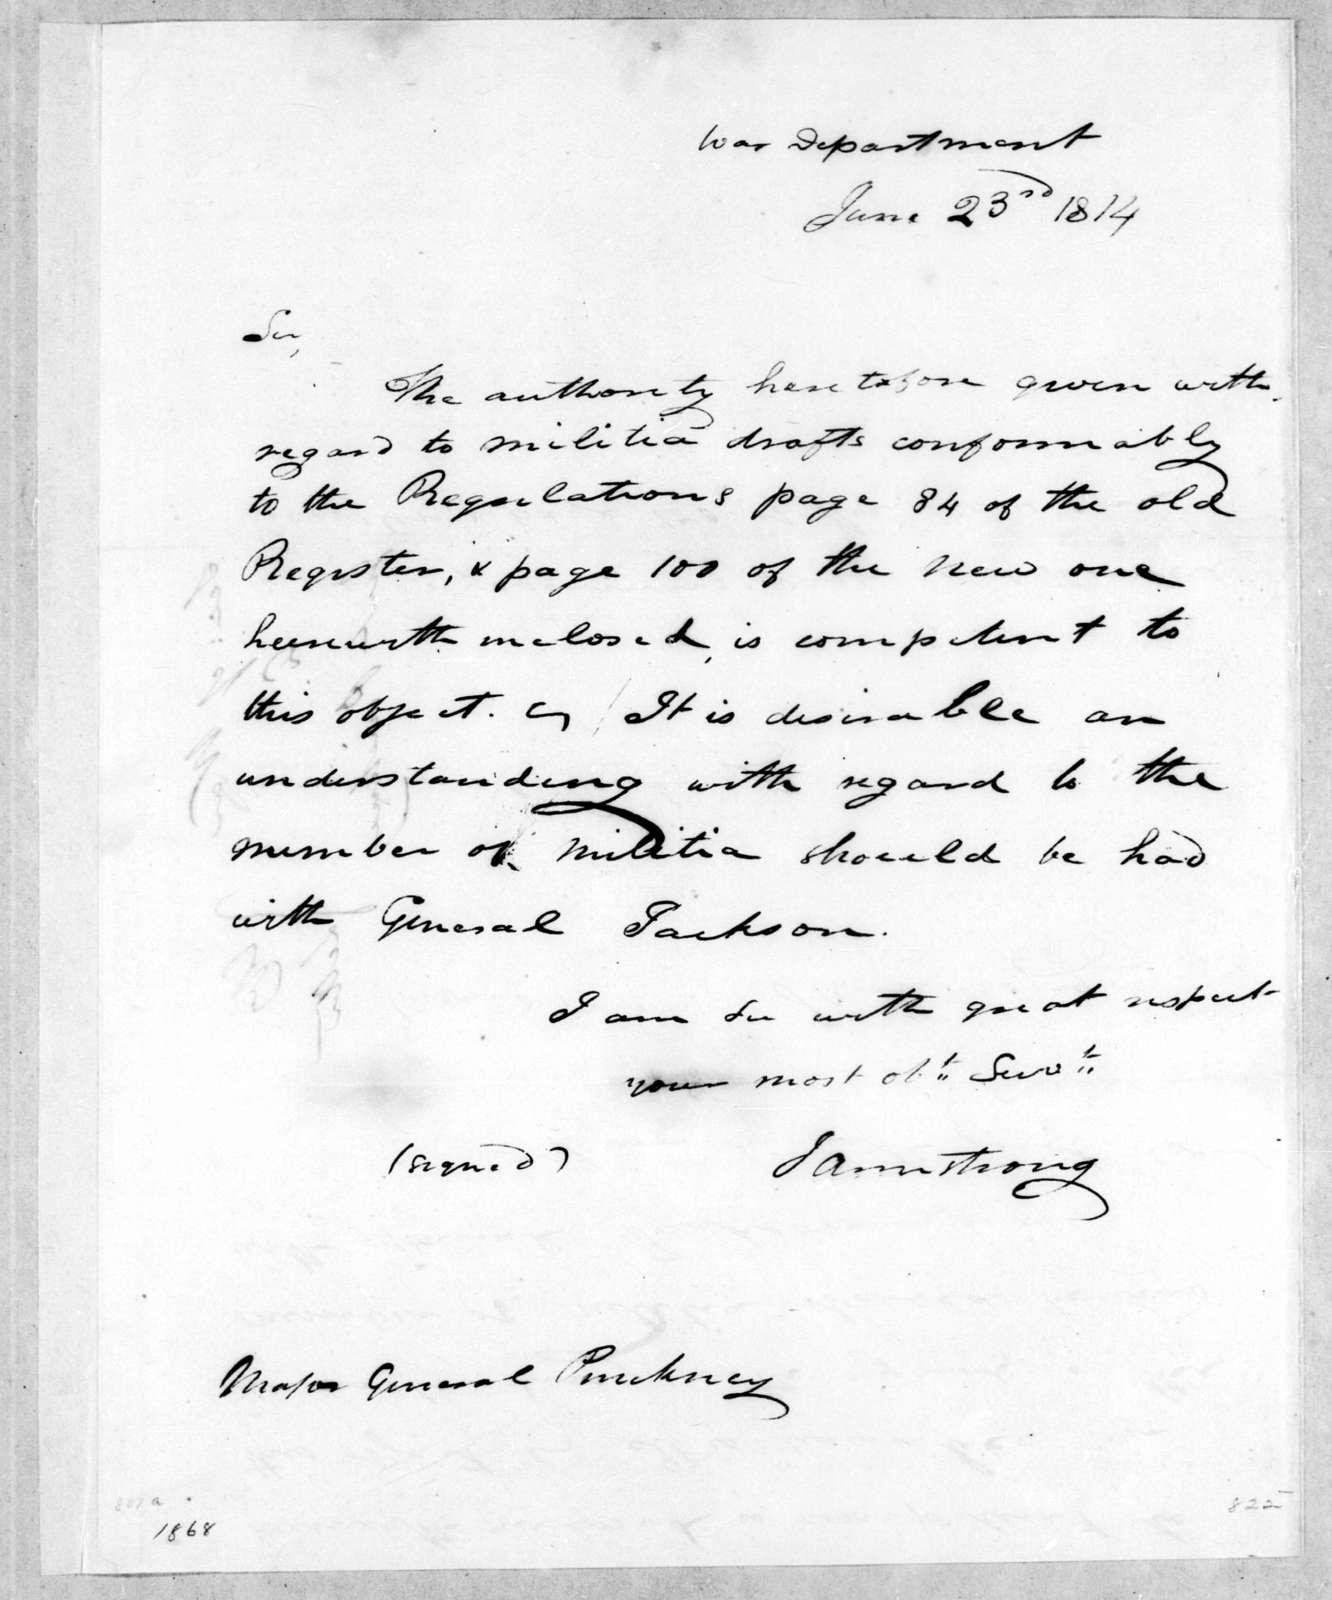 John Armstrong to Thomas Pinckney, June 23, 1814